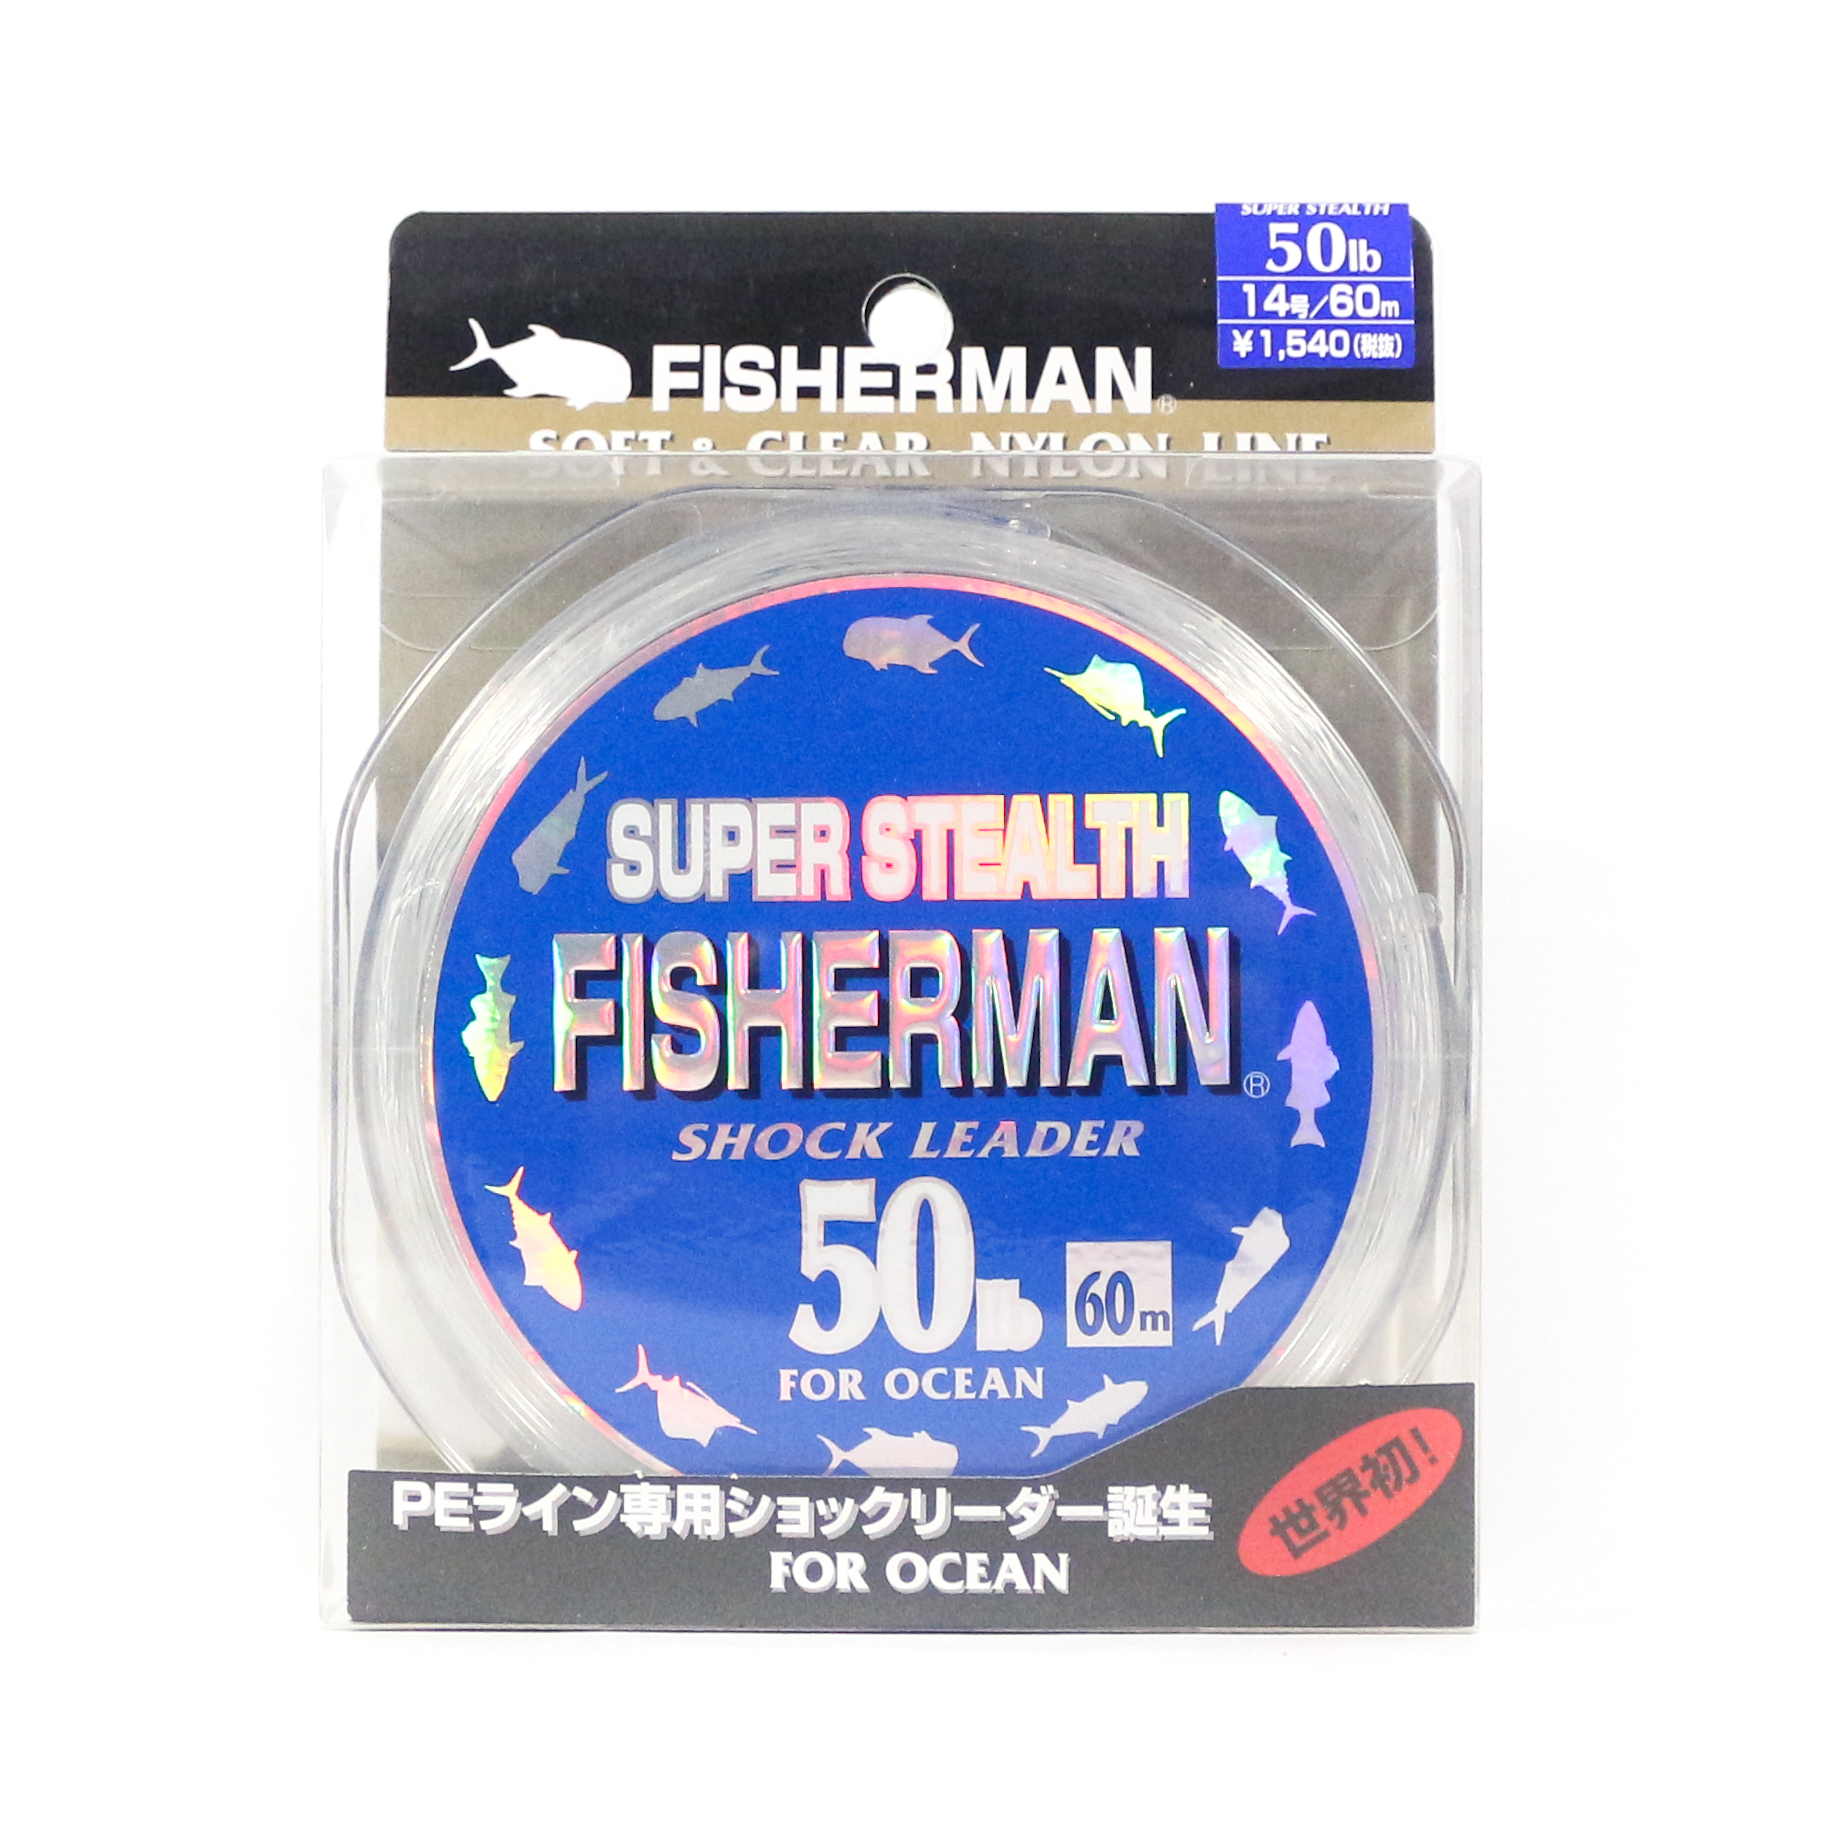 Fisherman Super Stealth Nylon Shock Leader 50 lb x 60 meter (0023)